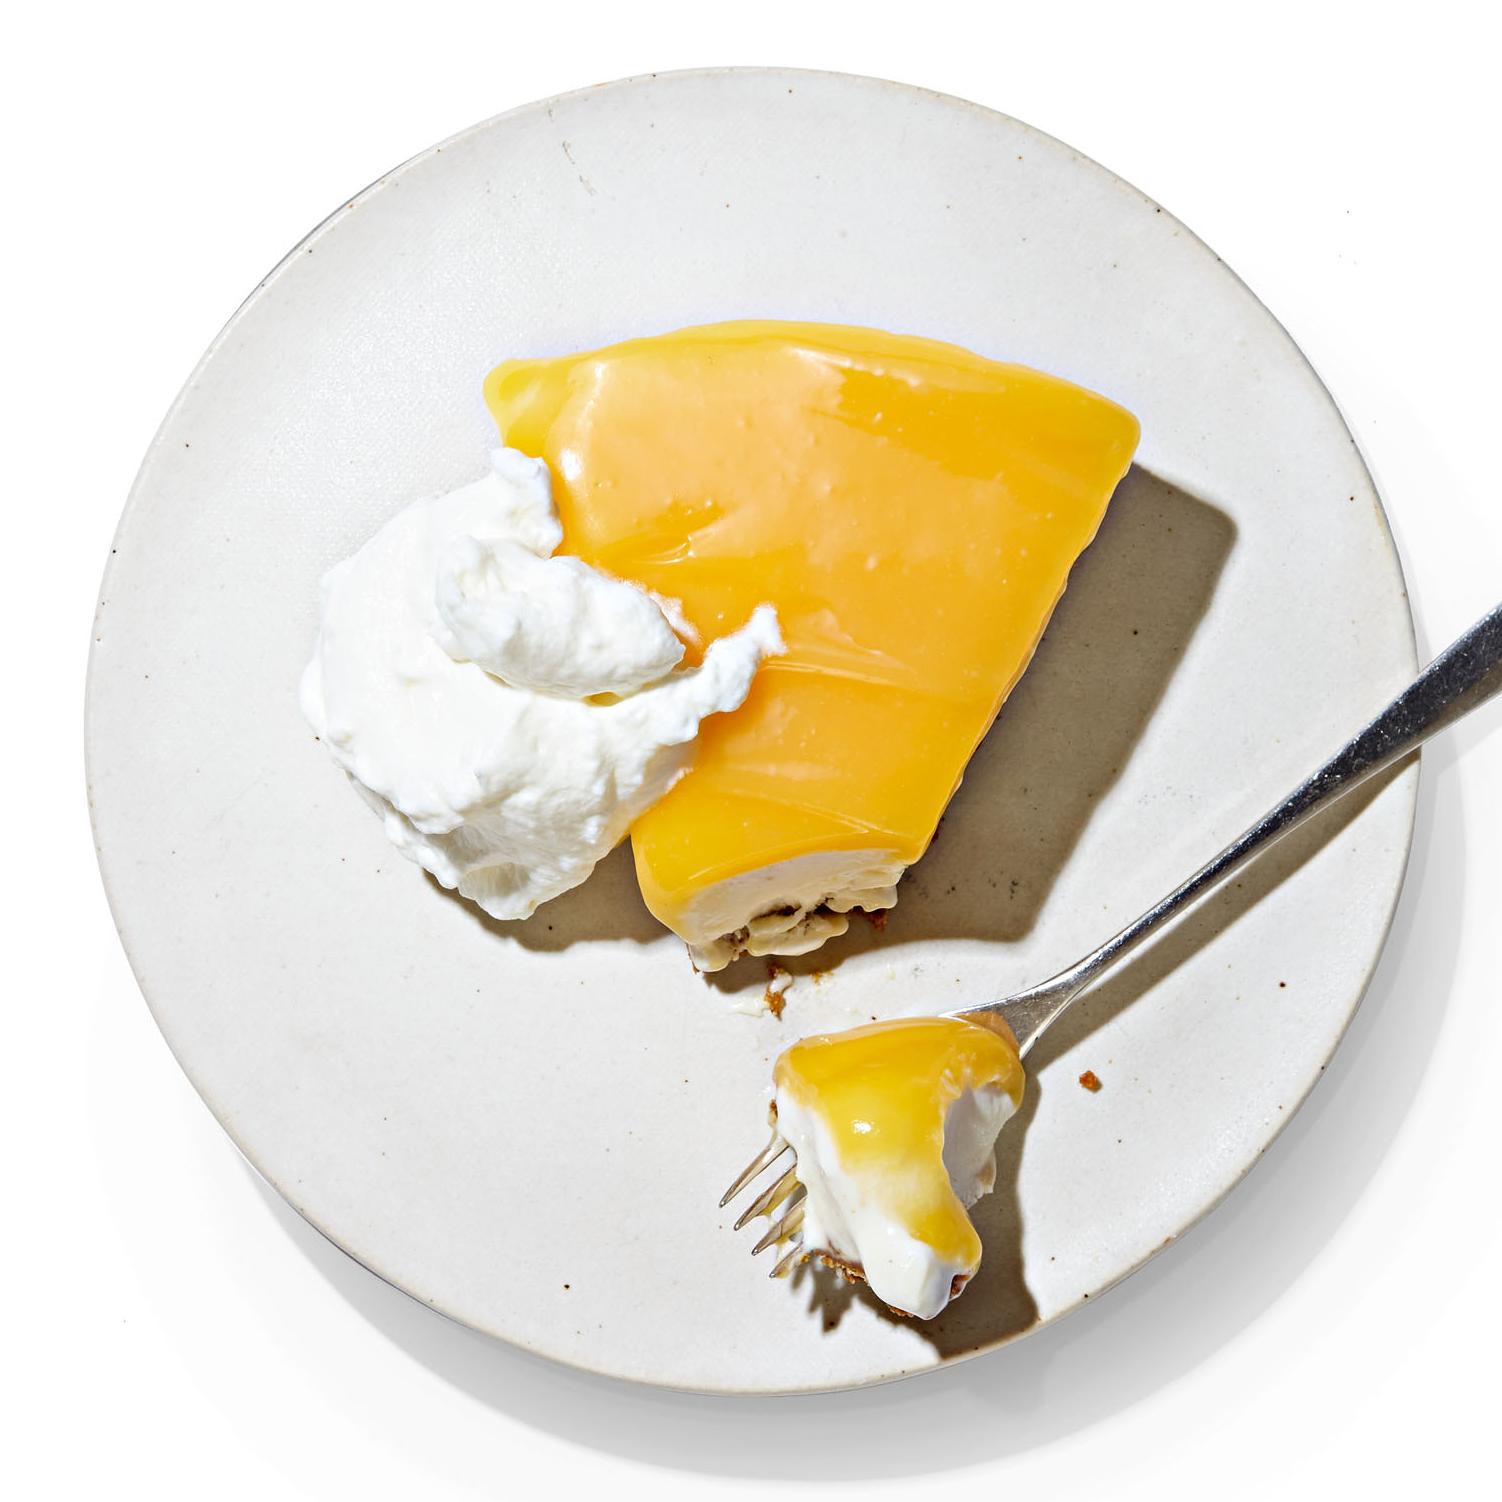 No-Bake Gingersnap Cheesecake with Lemon Curd